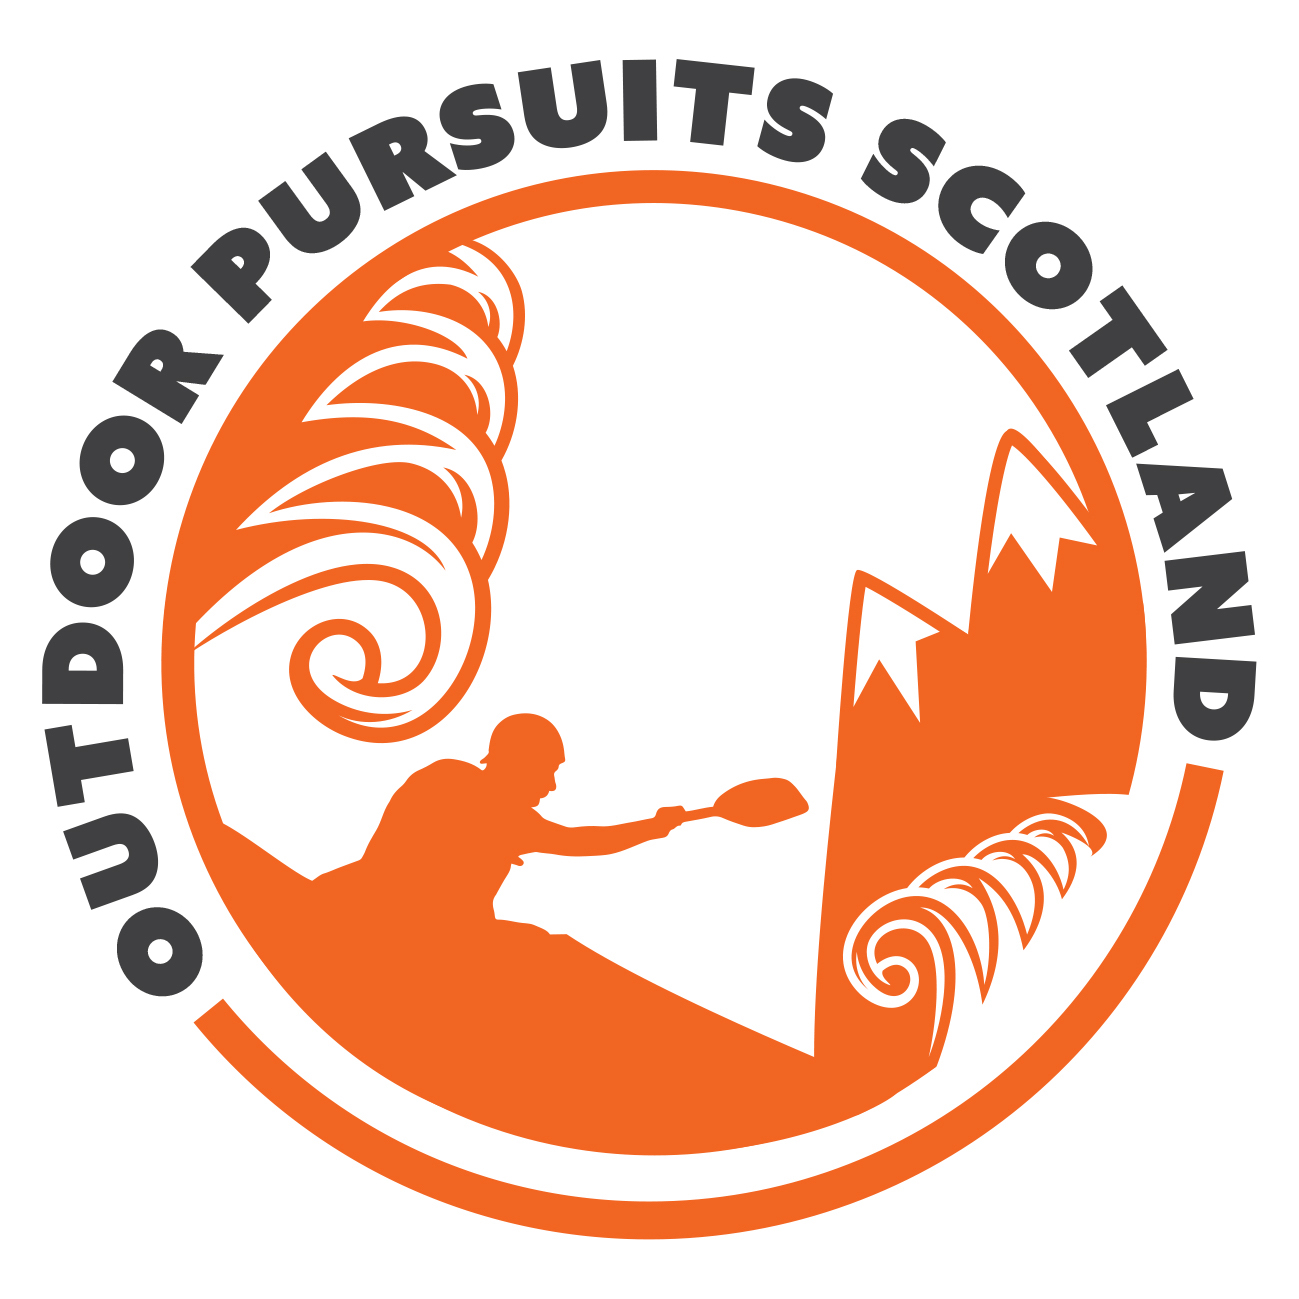 Outdoor Pursuits Scotland